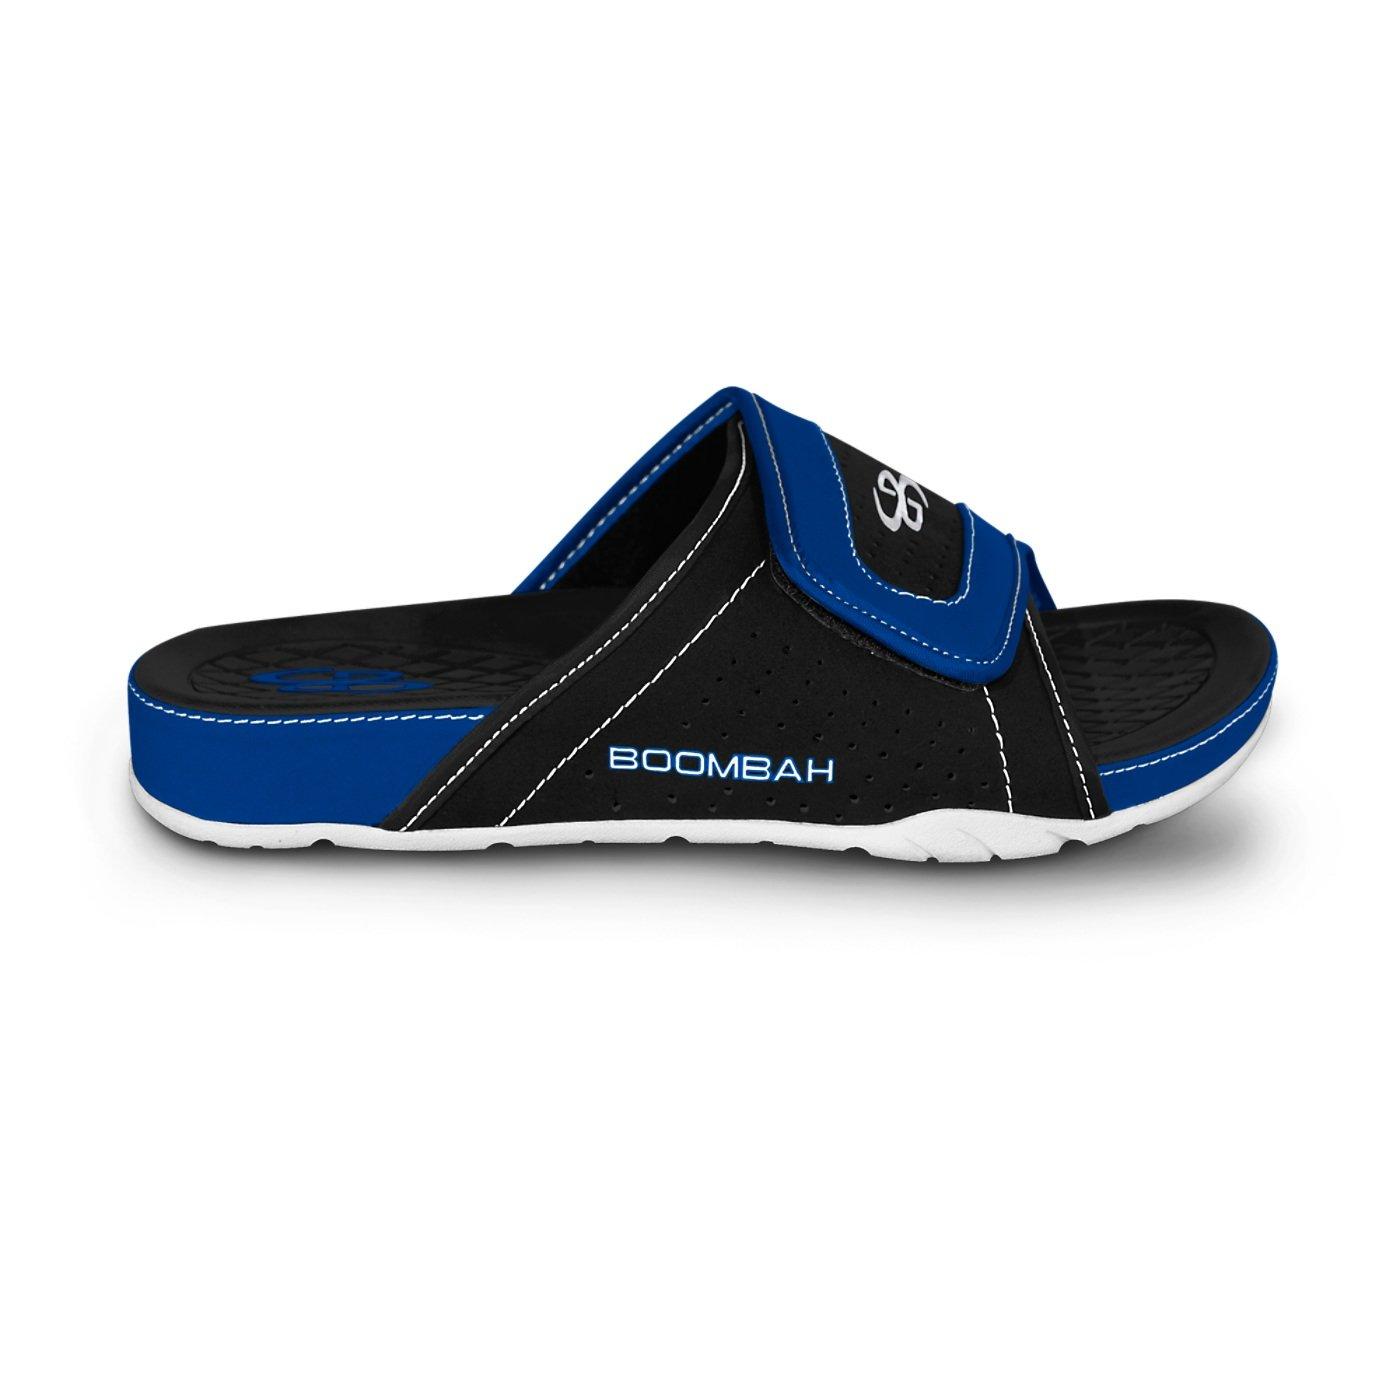 Boombah Men's Tyrant Slide Sandals - 32 Color Options - Multiple Sizes B077NK4VRH 12|Black/Royal